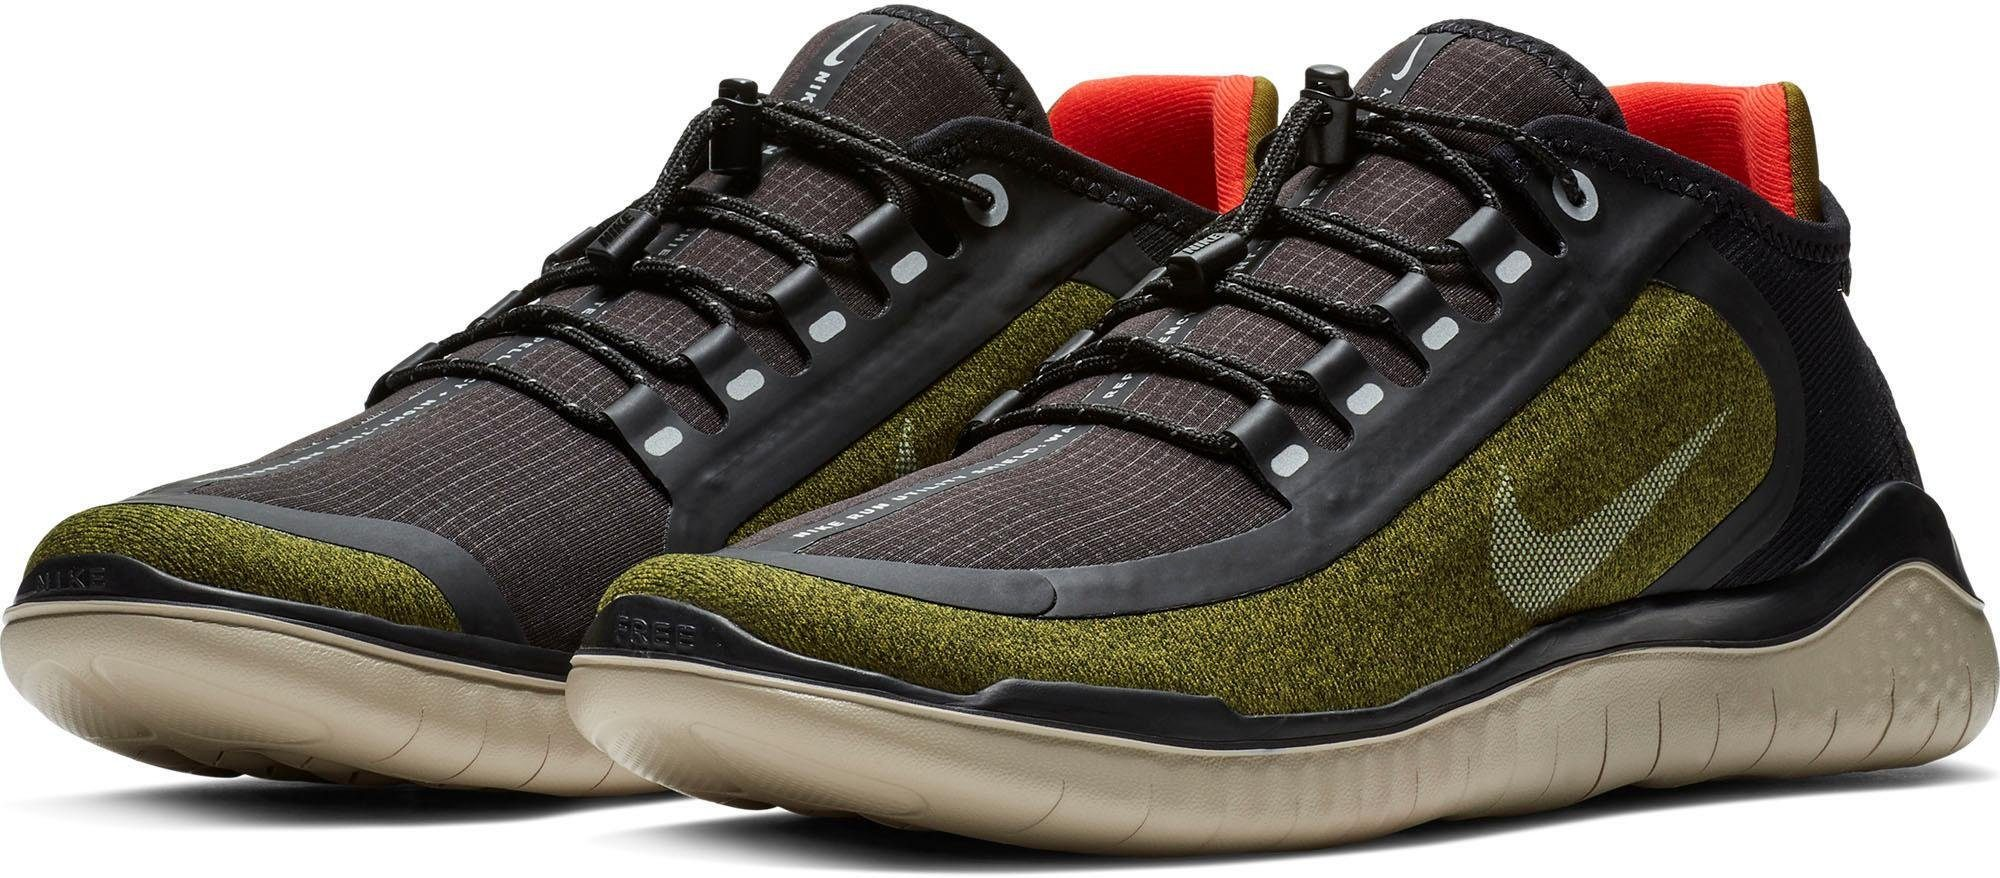 Nike »Free Run 2018 Shield« Laufschuh kaufen | OTTO